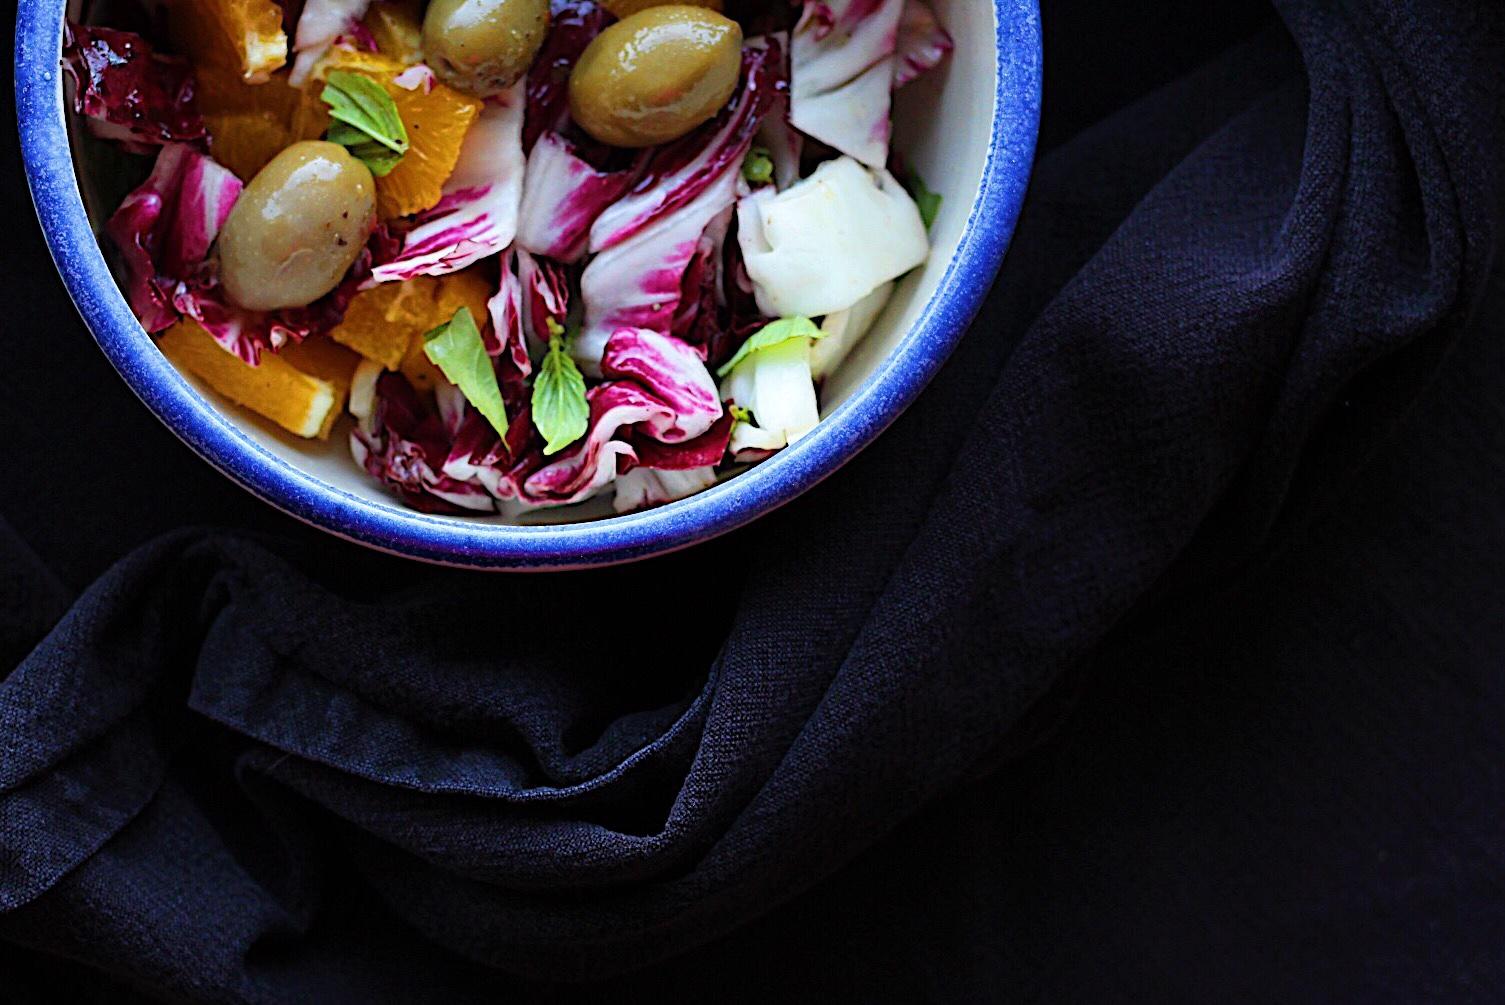 Orange Radicchio Salad And Other Ways To Use This Chicory